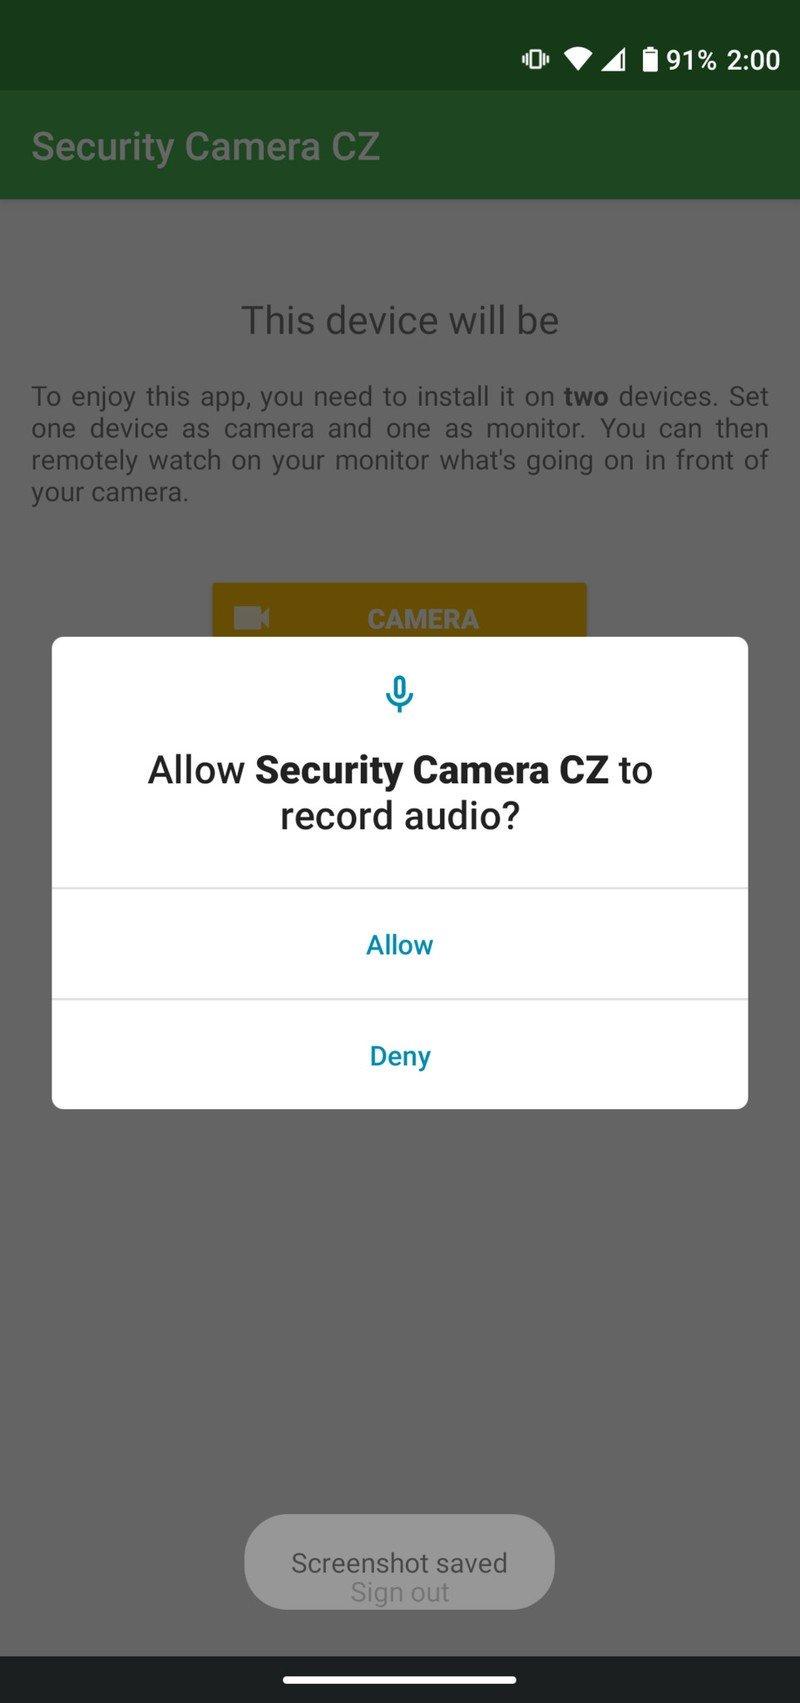 security-camera-cz-camera-6.jpg?itok=wnk